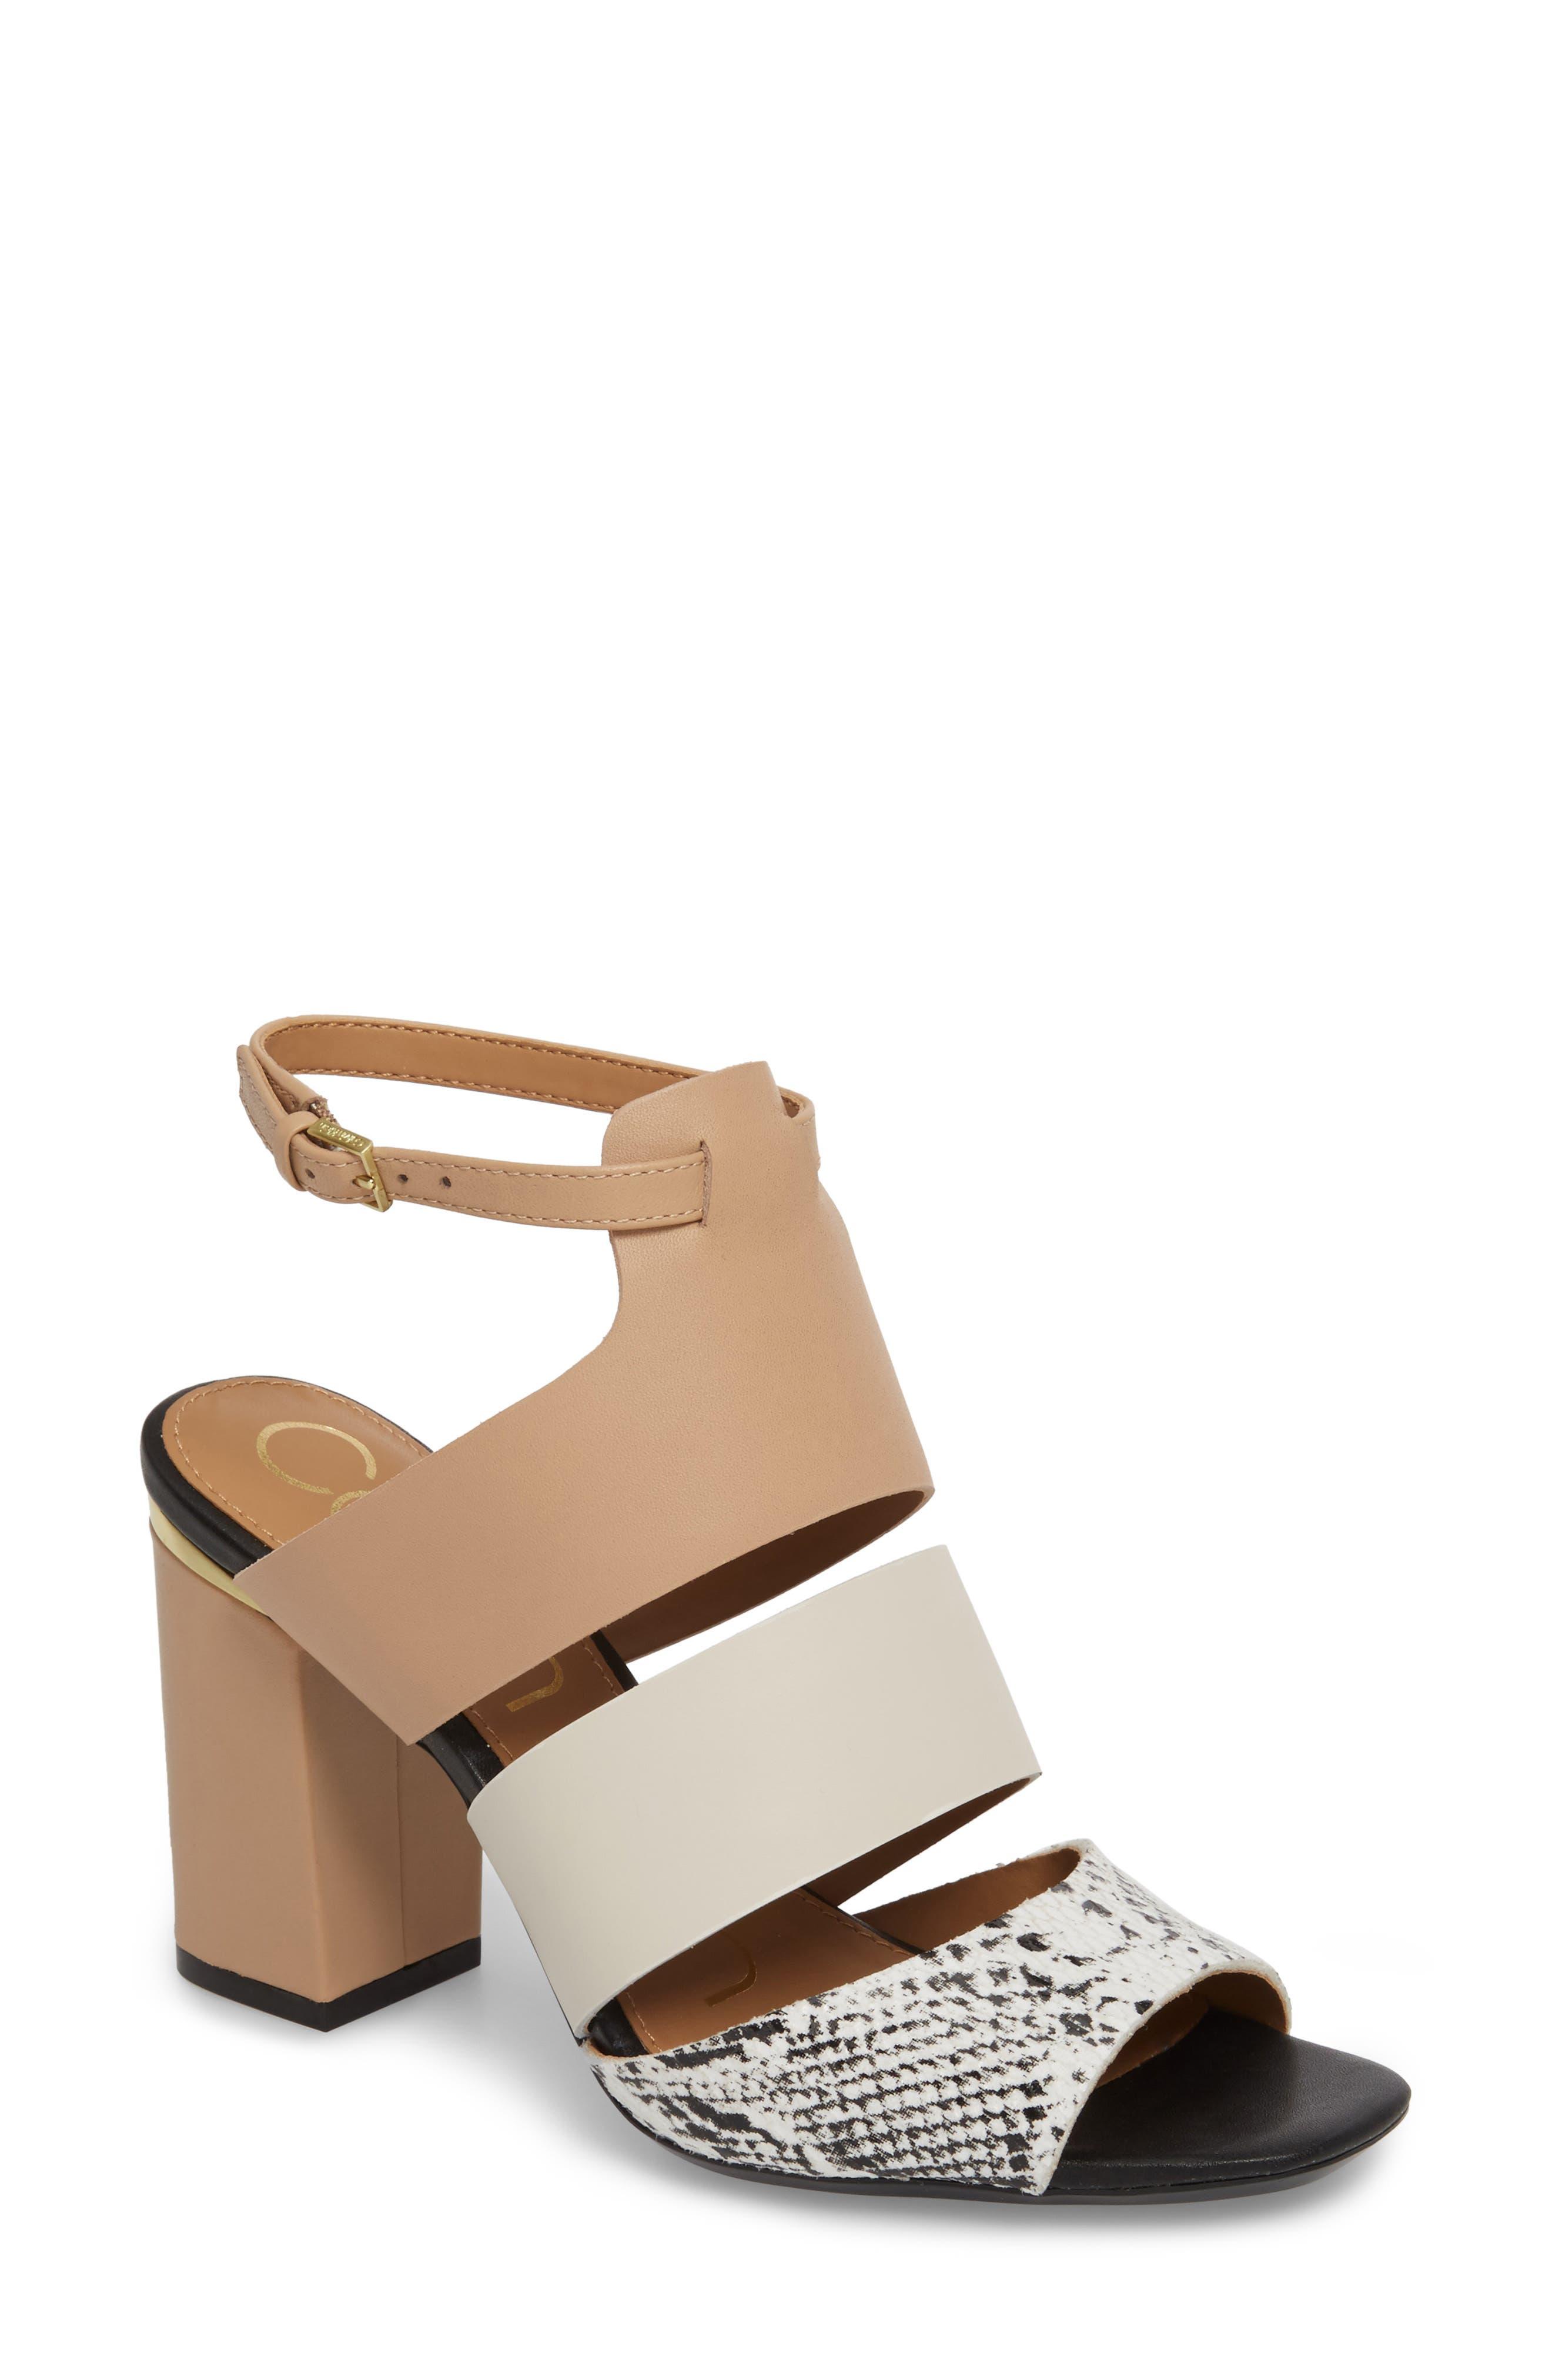 Caran Block Heel Sandal,                             Main thumbnail 1, color,                             Black/ White Leather